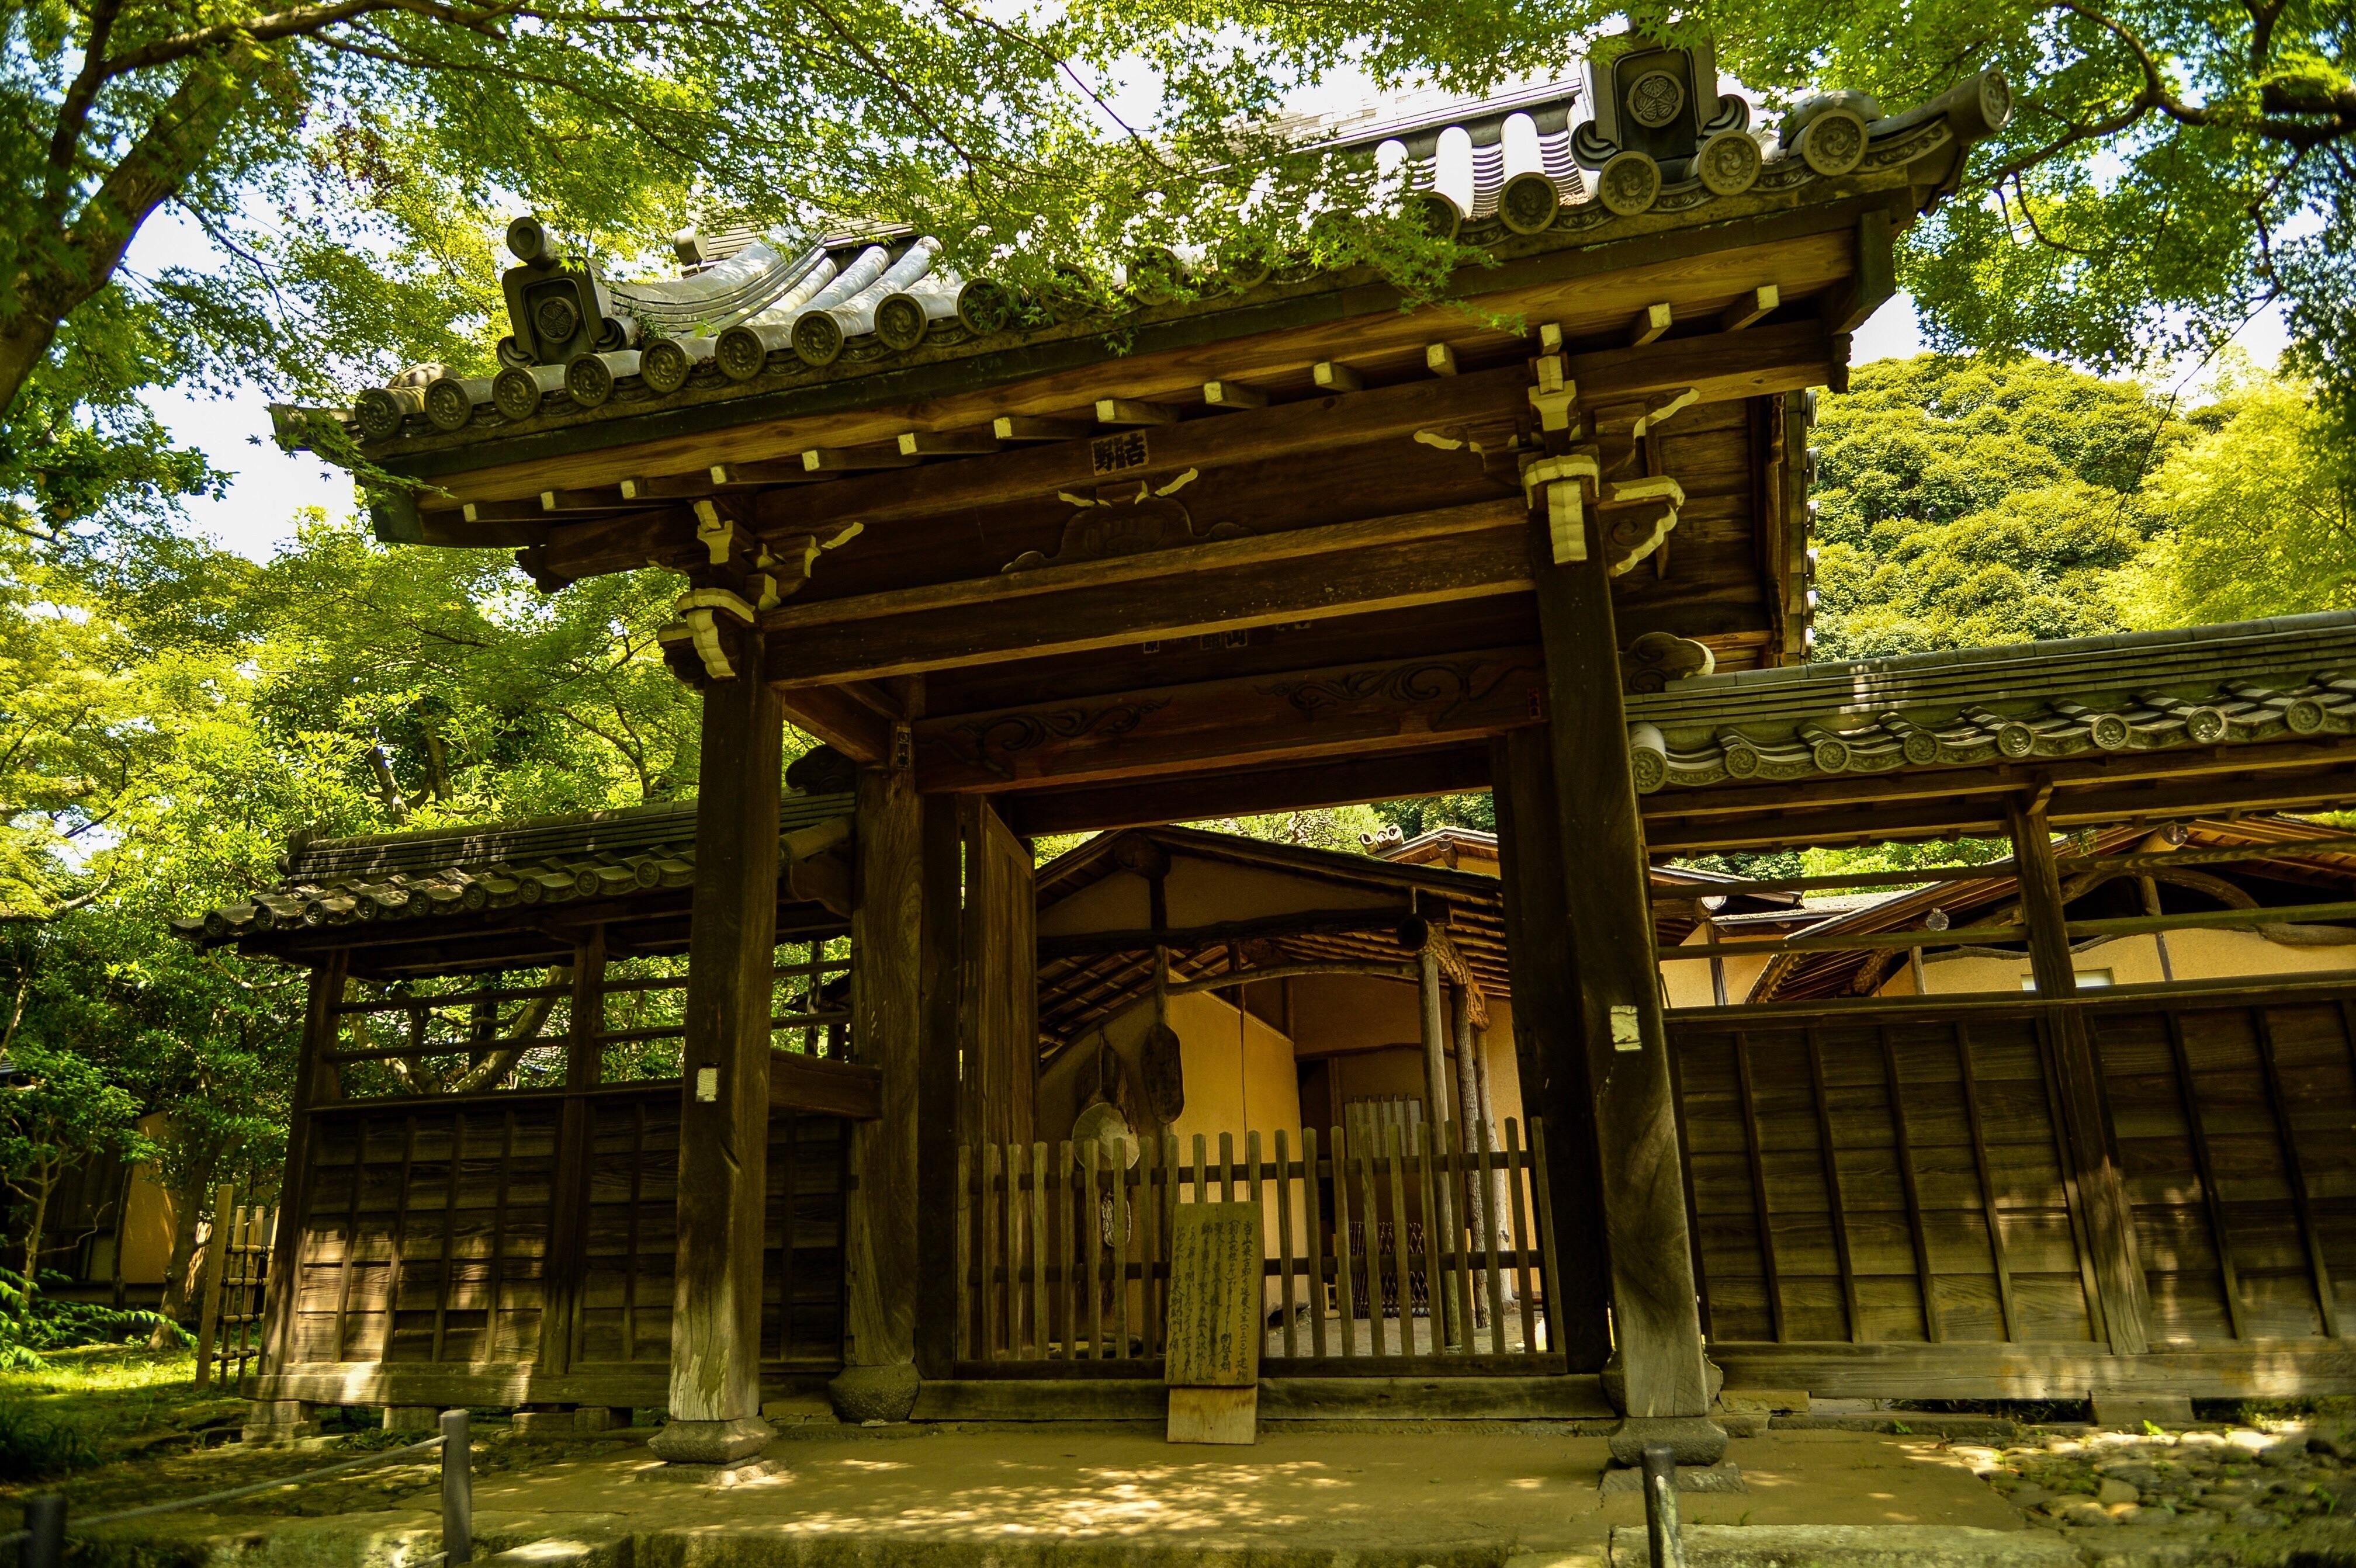 f:id:muramasachang:20210613055200j:image